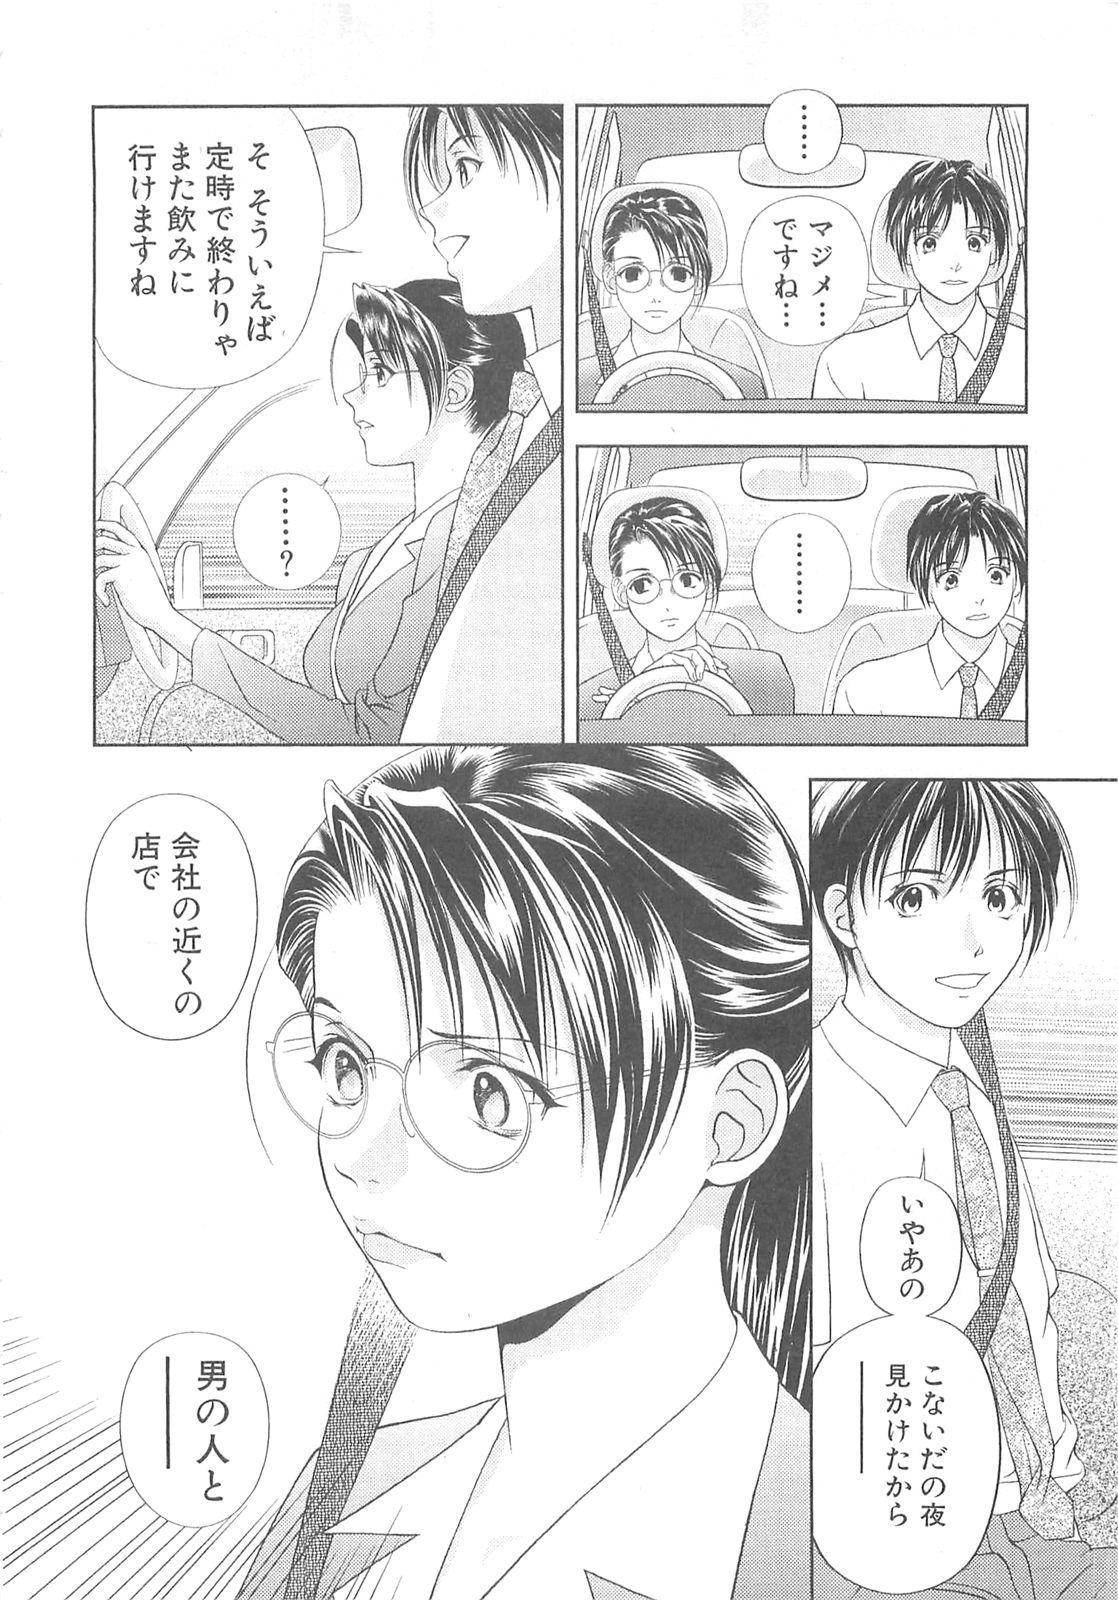 Tenshi no Kyuu - Angel's Pretty Hip 176